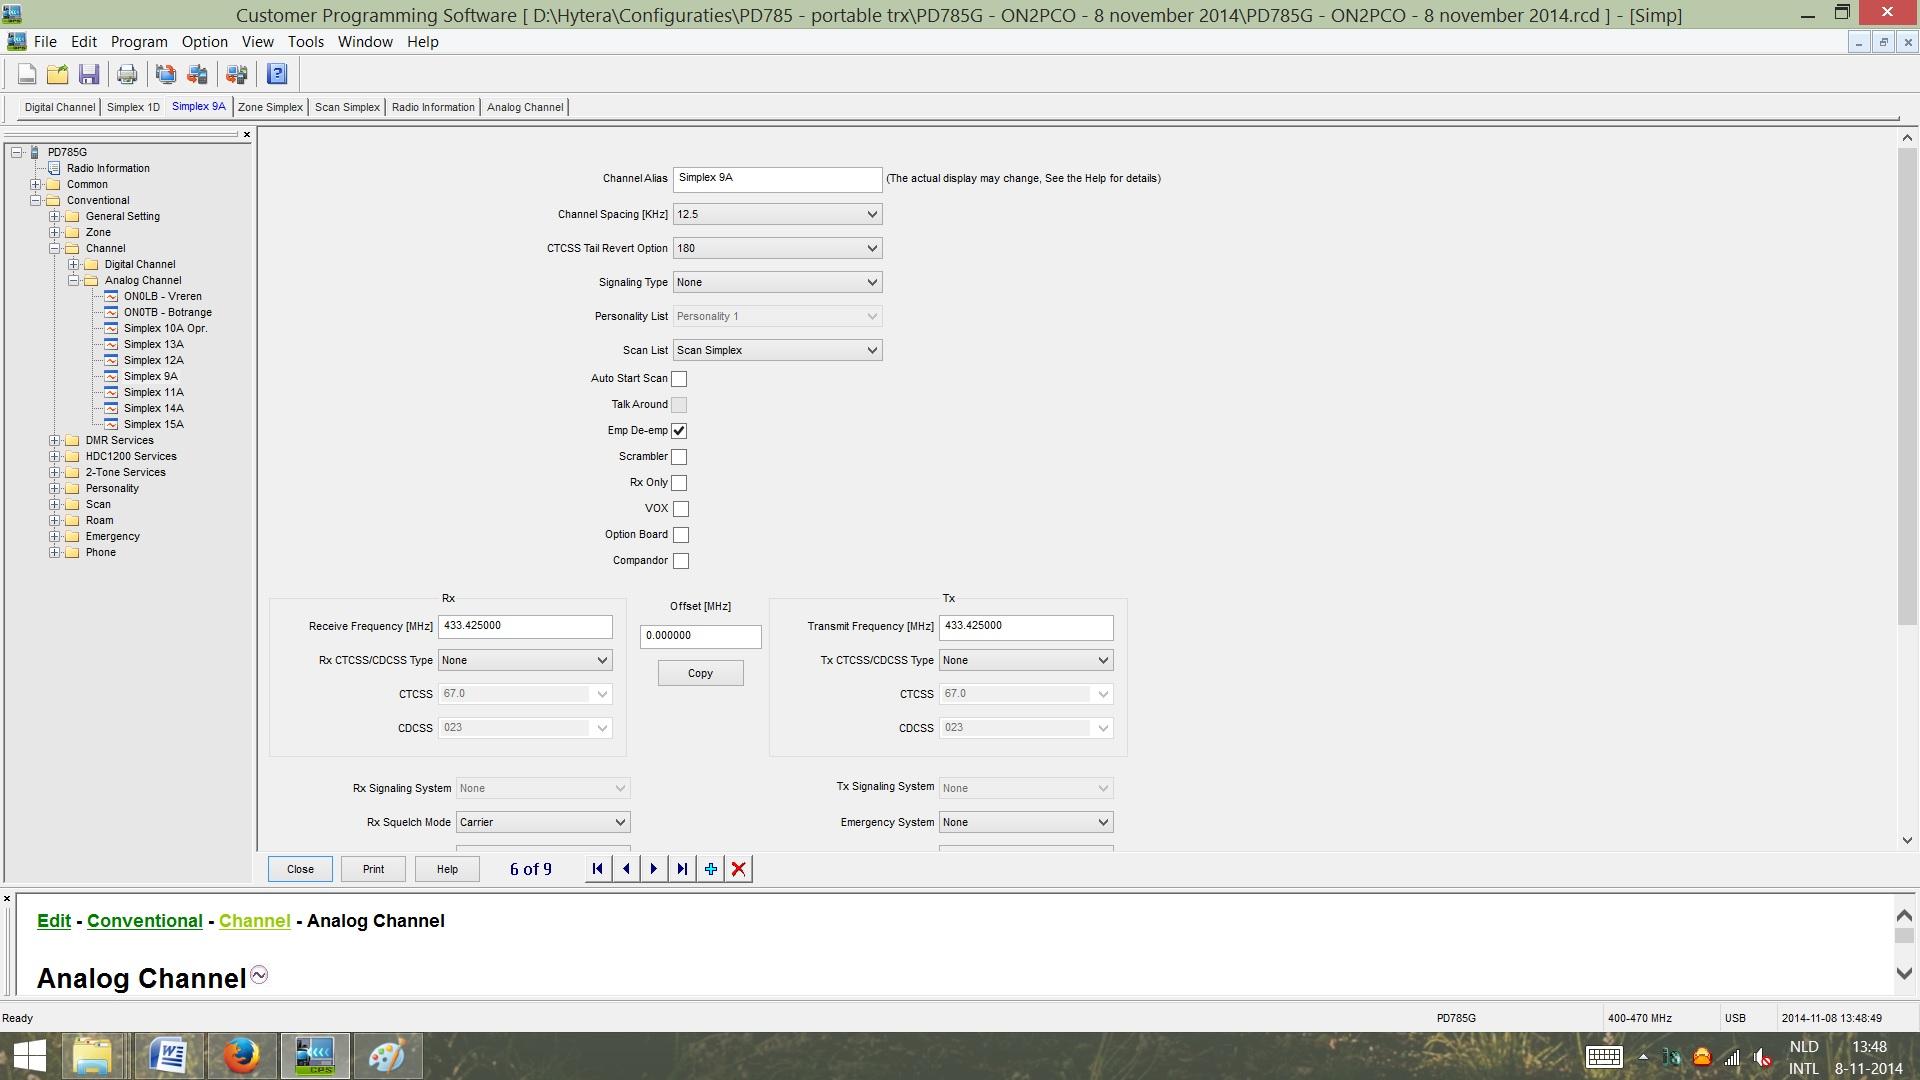 FIGUUR 5 - Channel Simplex Analoog - deel 1